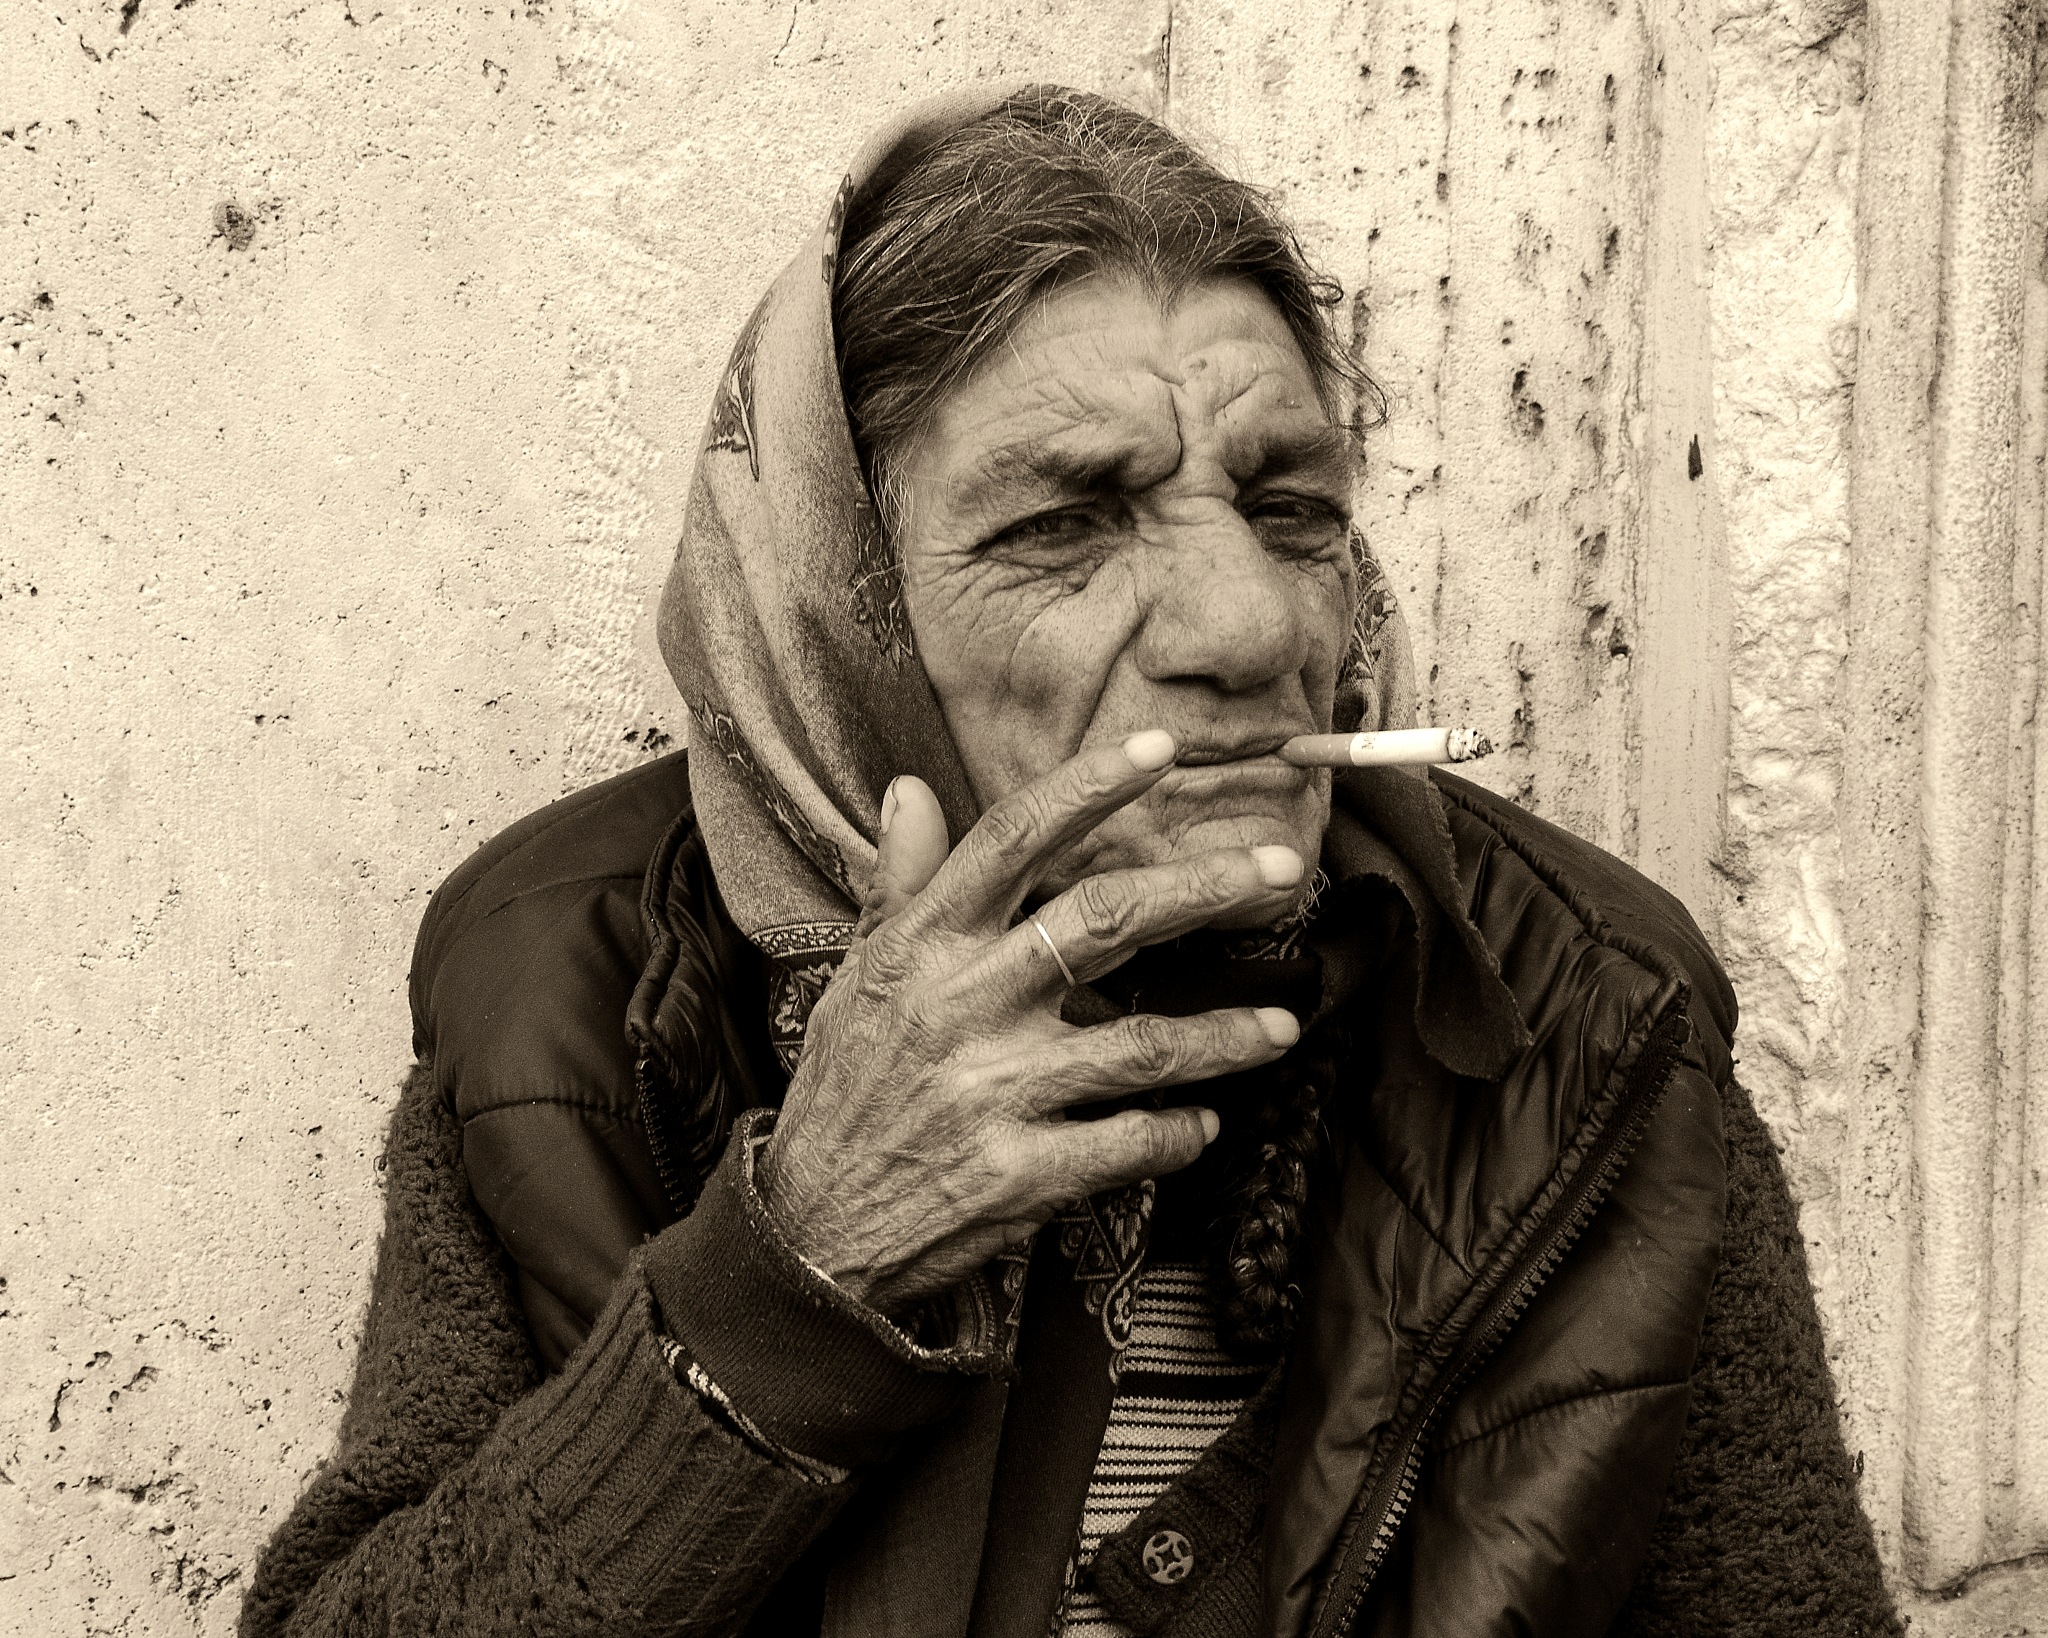 The smoker woman by marokkyprianou